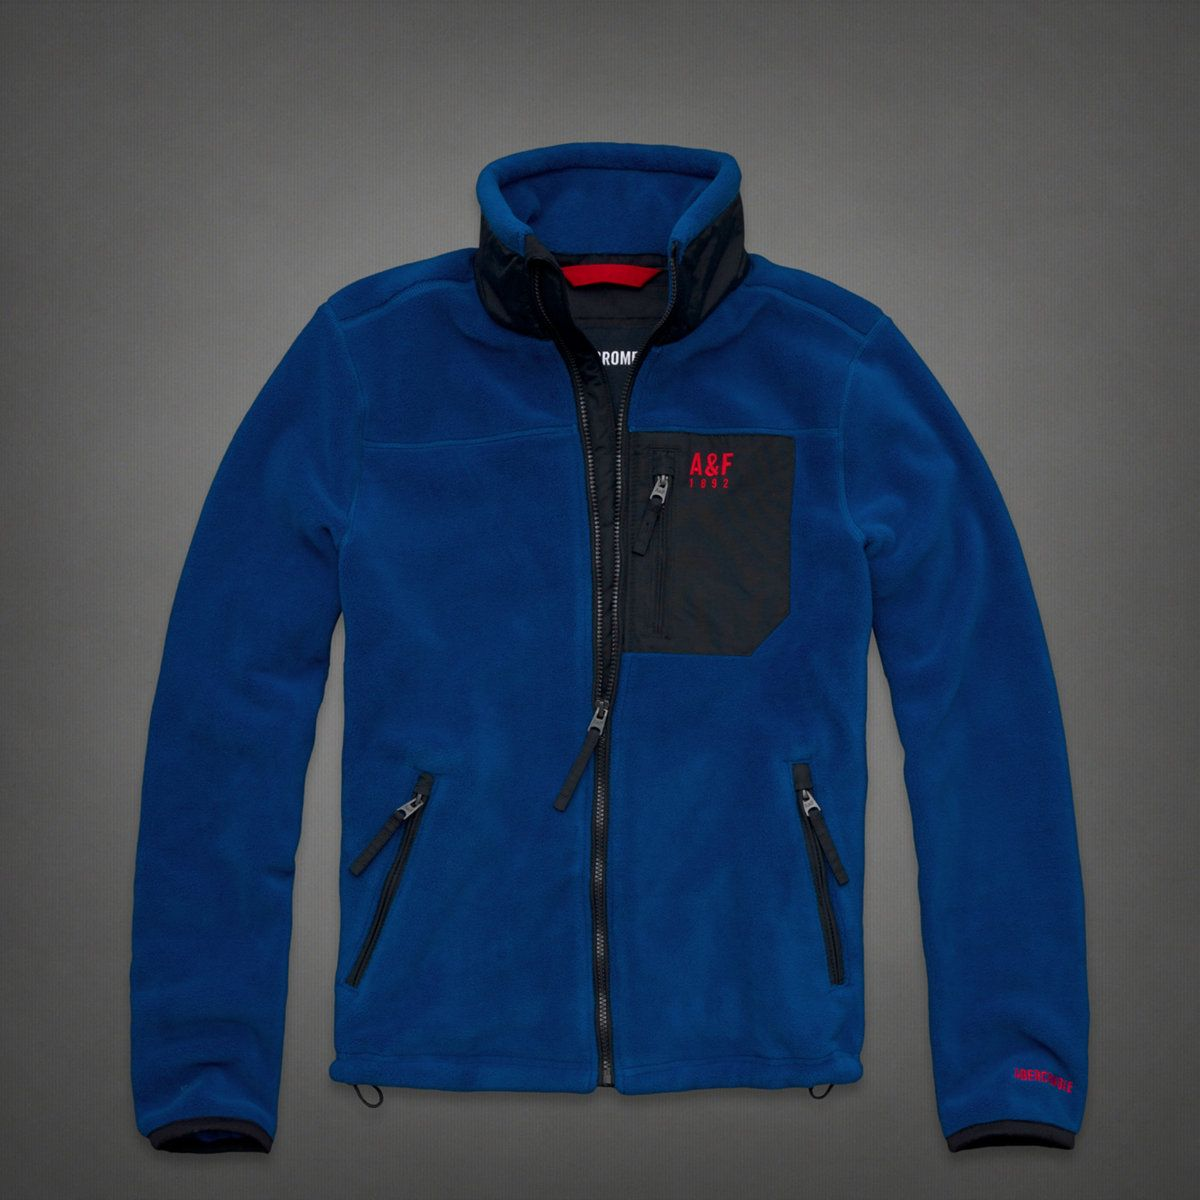 Mens A&f Mountain Fleece Jacket | Mens Outerwear